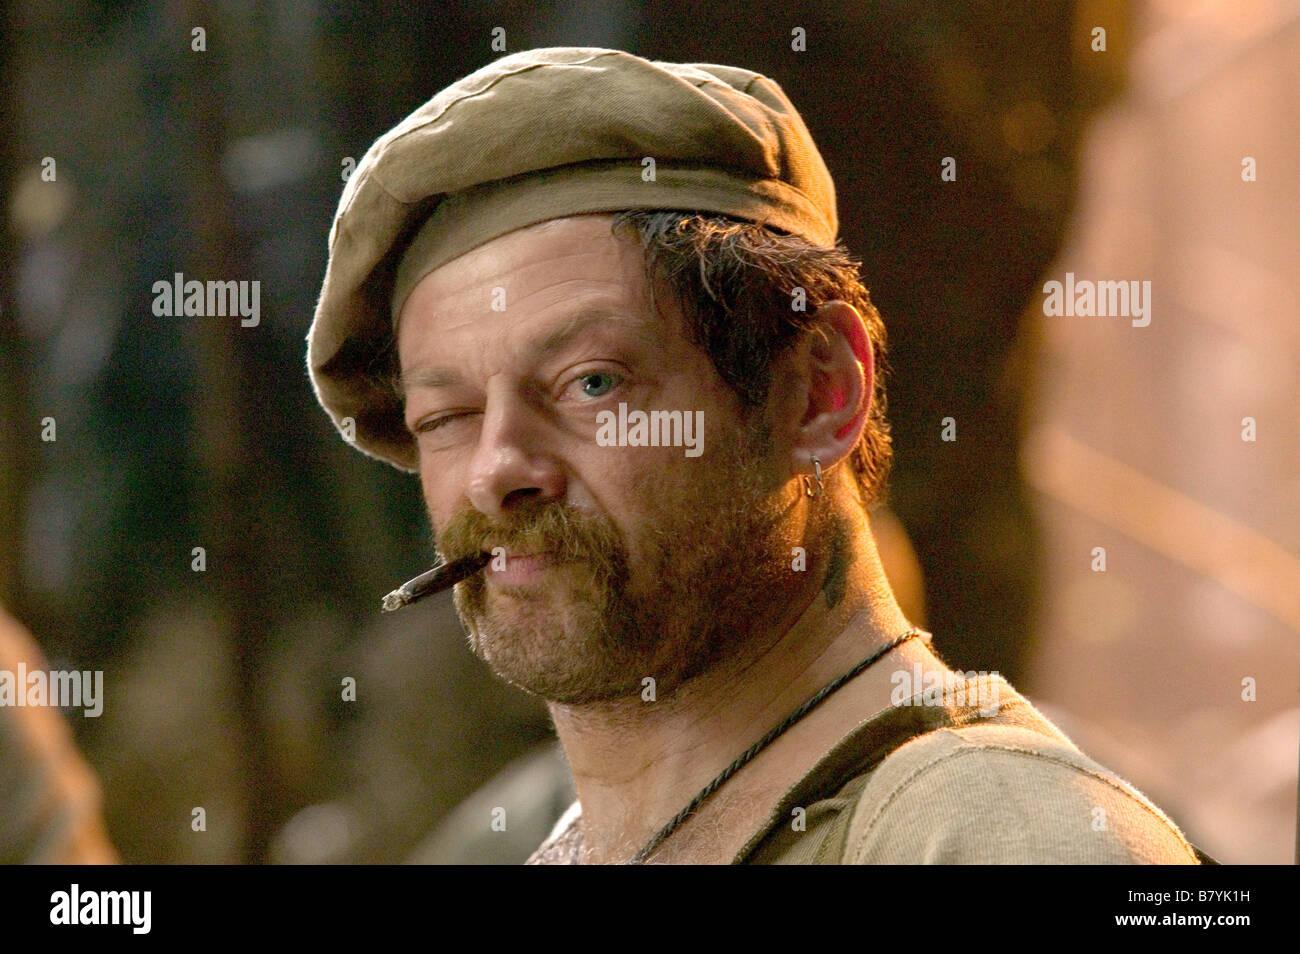 King Kong  Year: 2005 - New Zealand / USA Andy Serkis Director: Peter Jackson - Stock Image